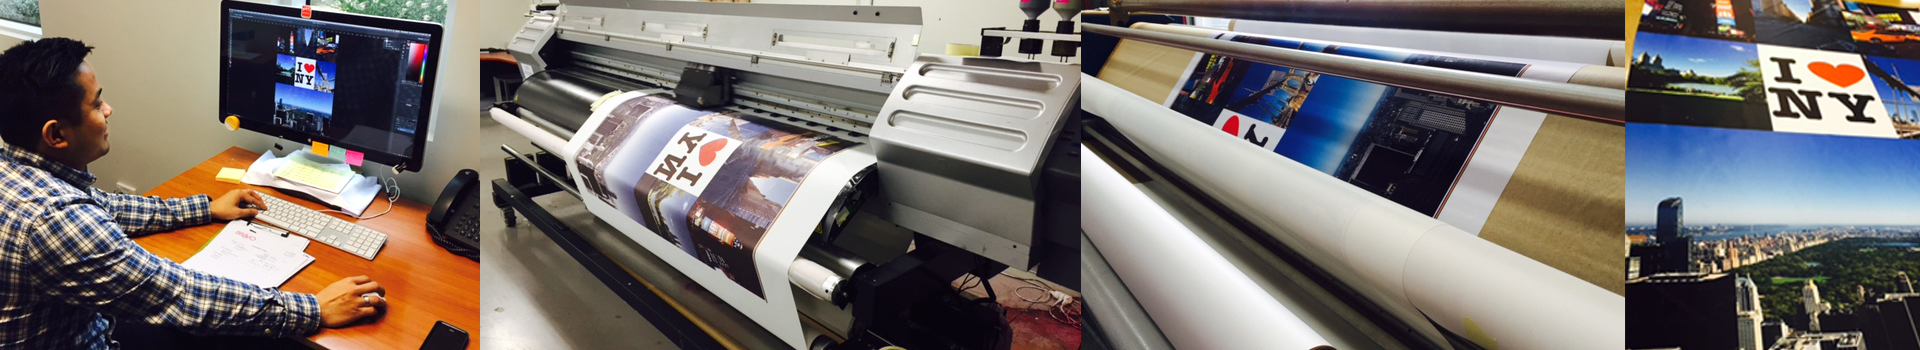 About - Bravo - Fabric & Digital Printers